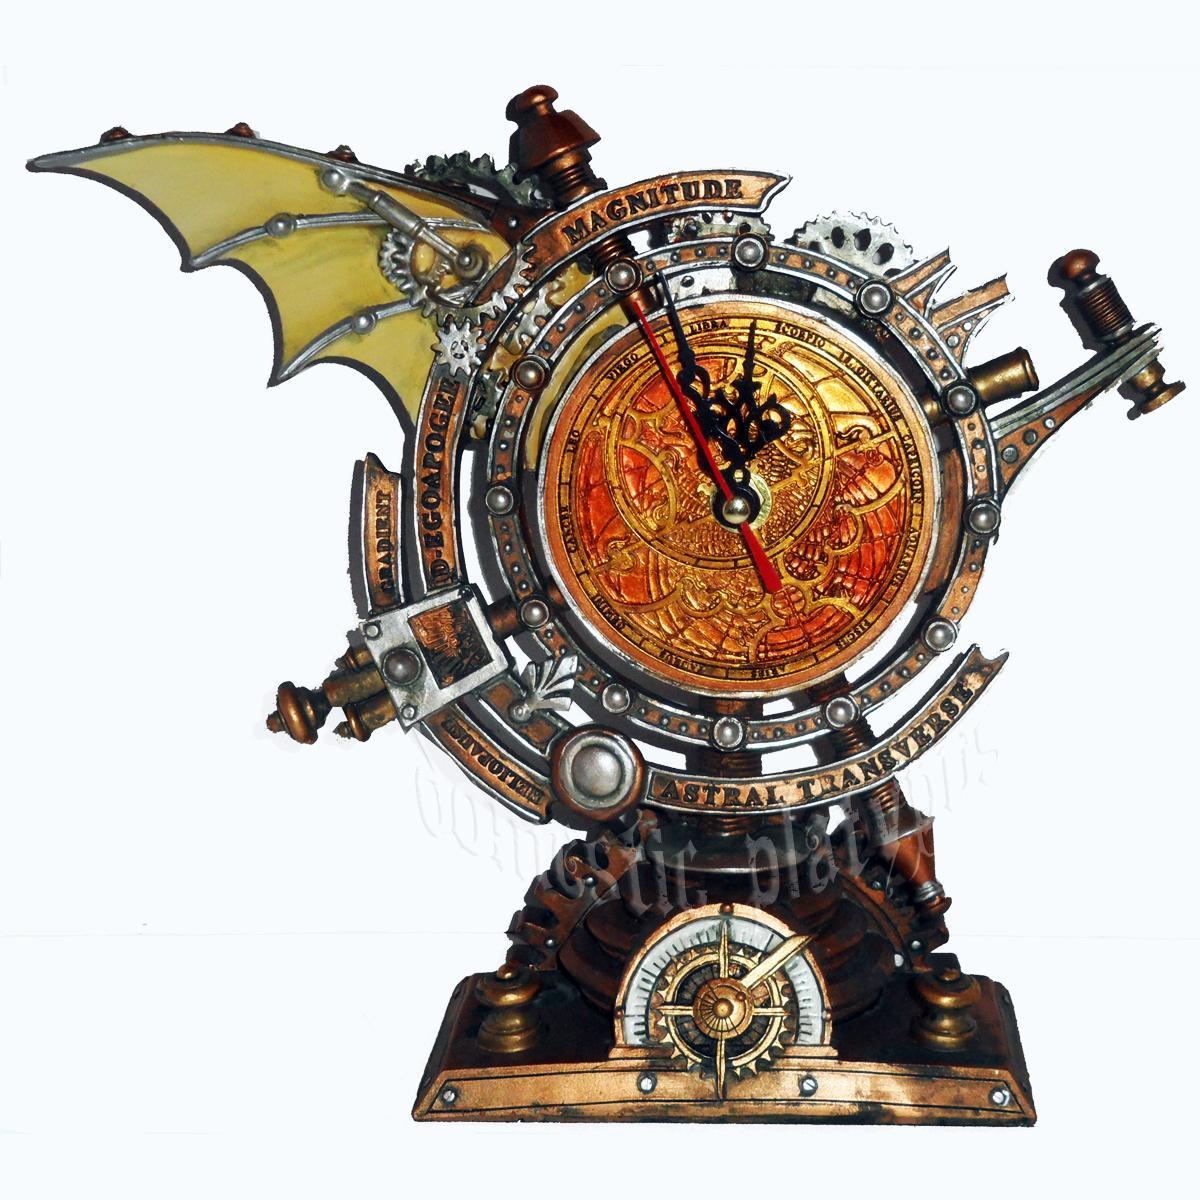 Alchemy STORMGRAVE CHRONOMETER Steampunk Mantle Clock https://t.co/a91gwHEcGo #homedecor #fantasy #steampunk #clocks